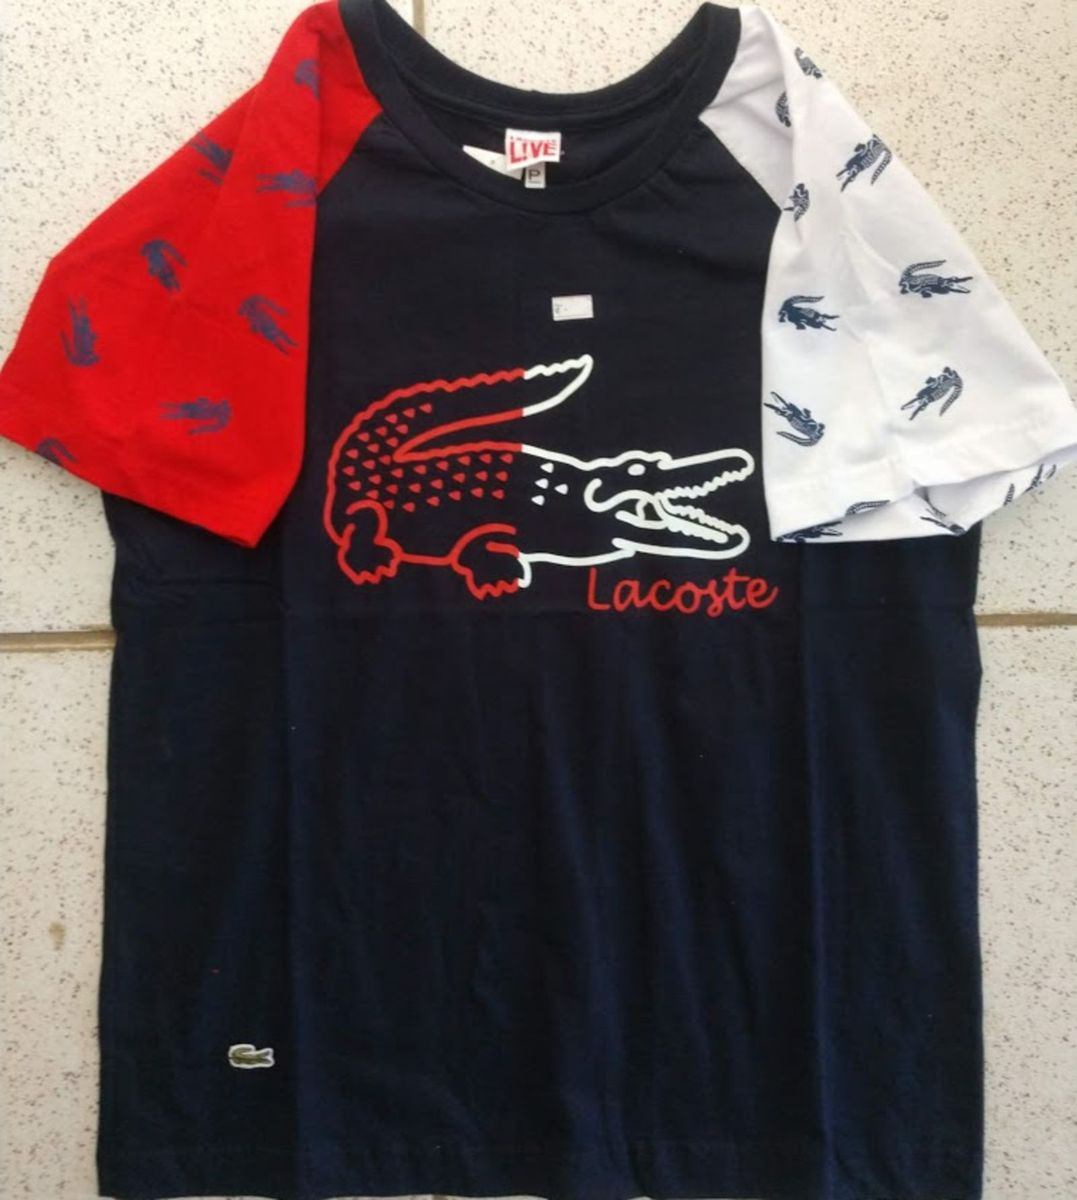 Camiseta Lacoste Estampada Tamanho P   Camiseta Masculina Lacoste ... a440e3d06b